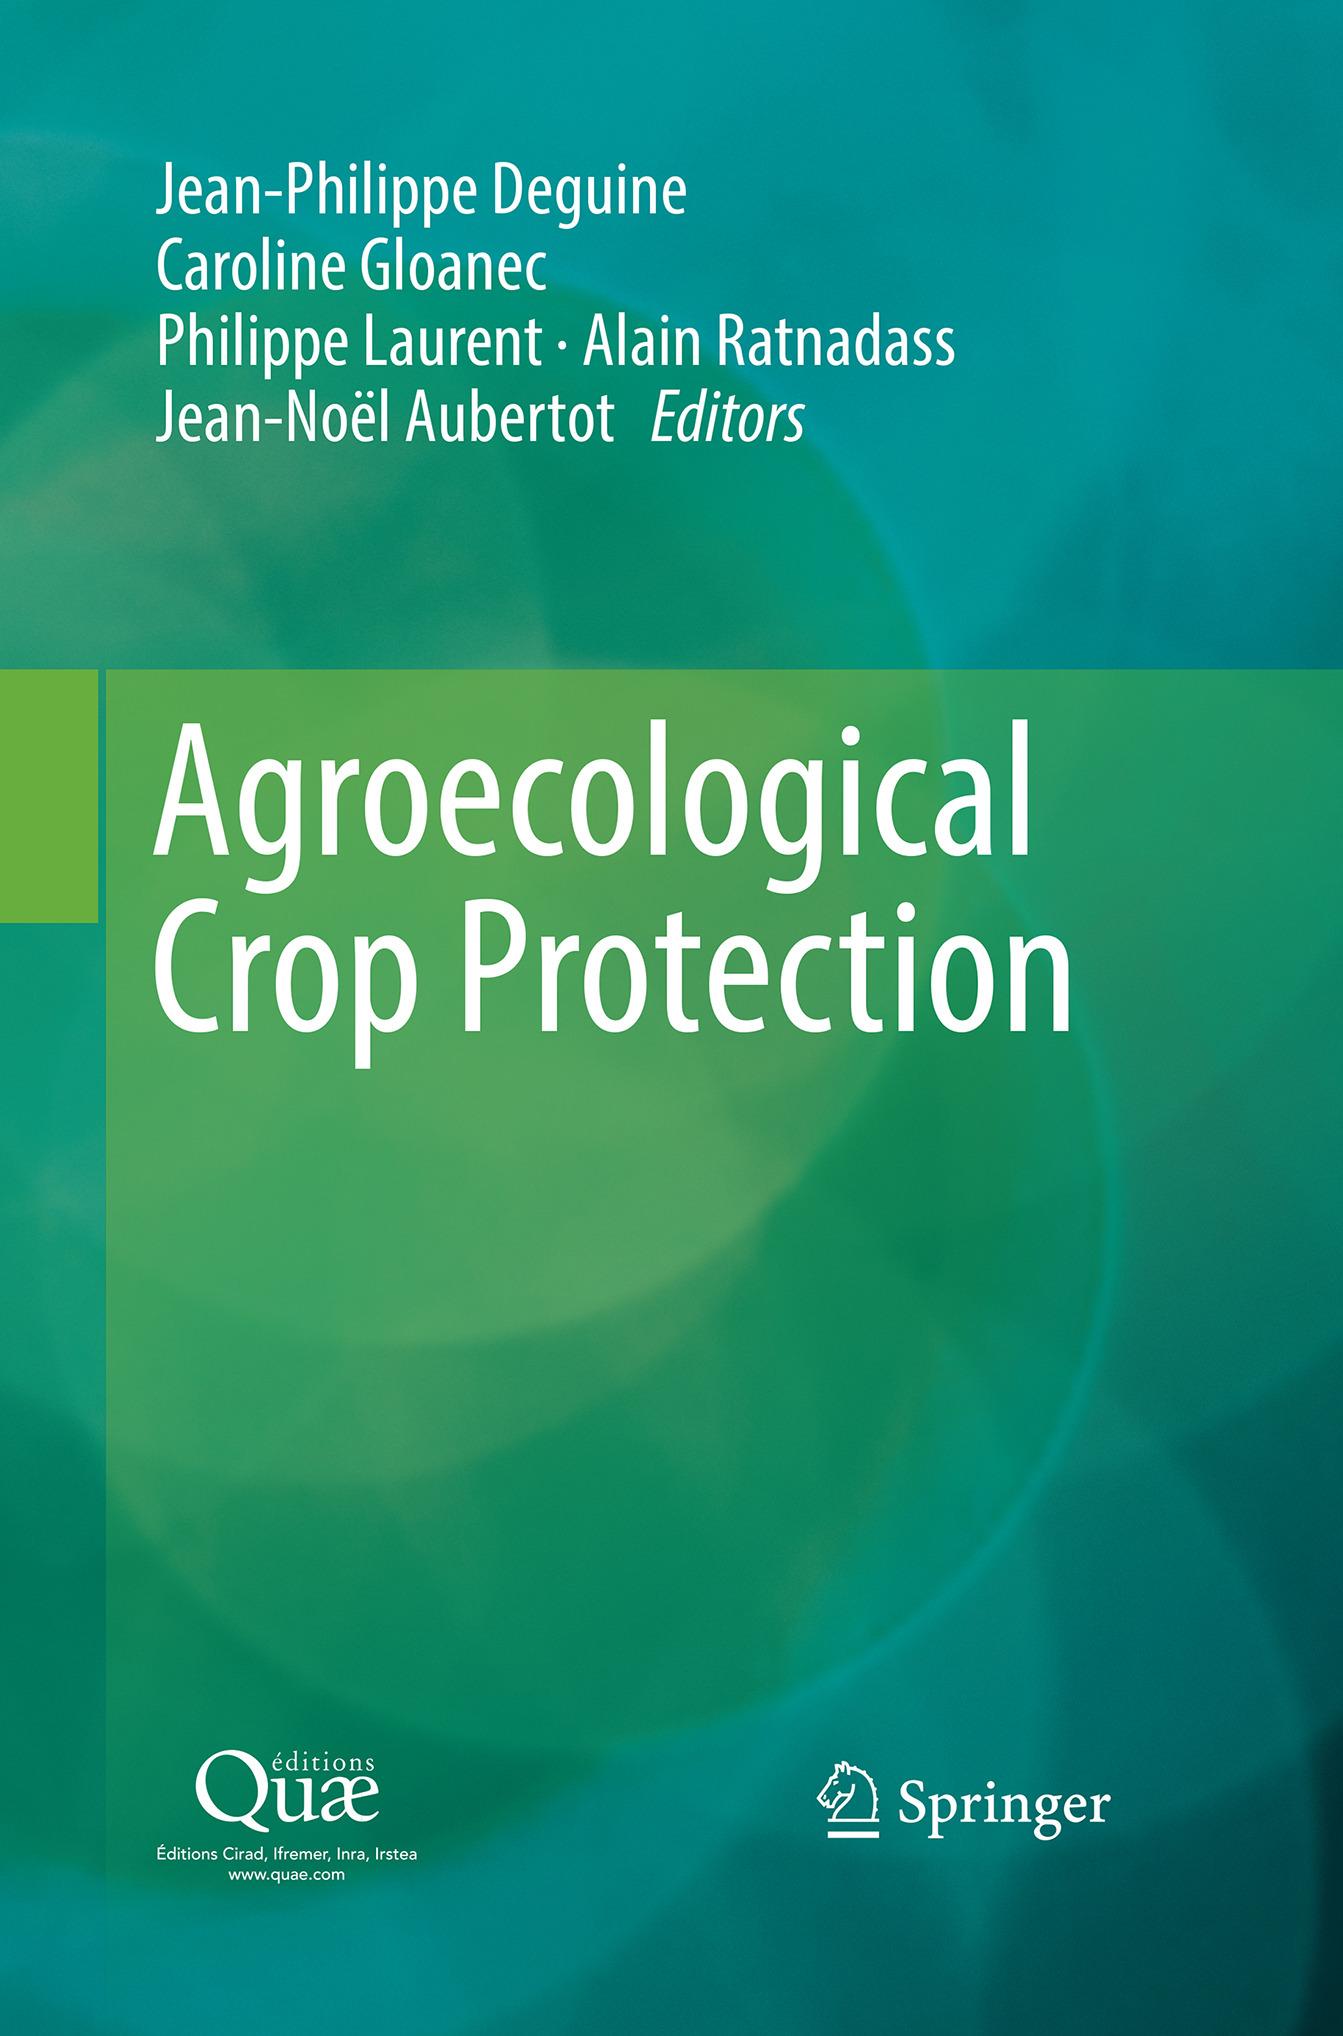 Aubertot, Jean-Noël - Agroecological Crop Protection, ebook